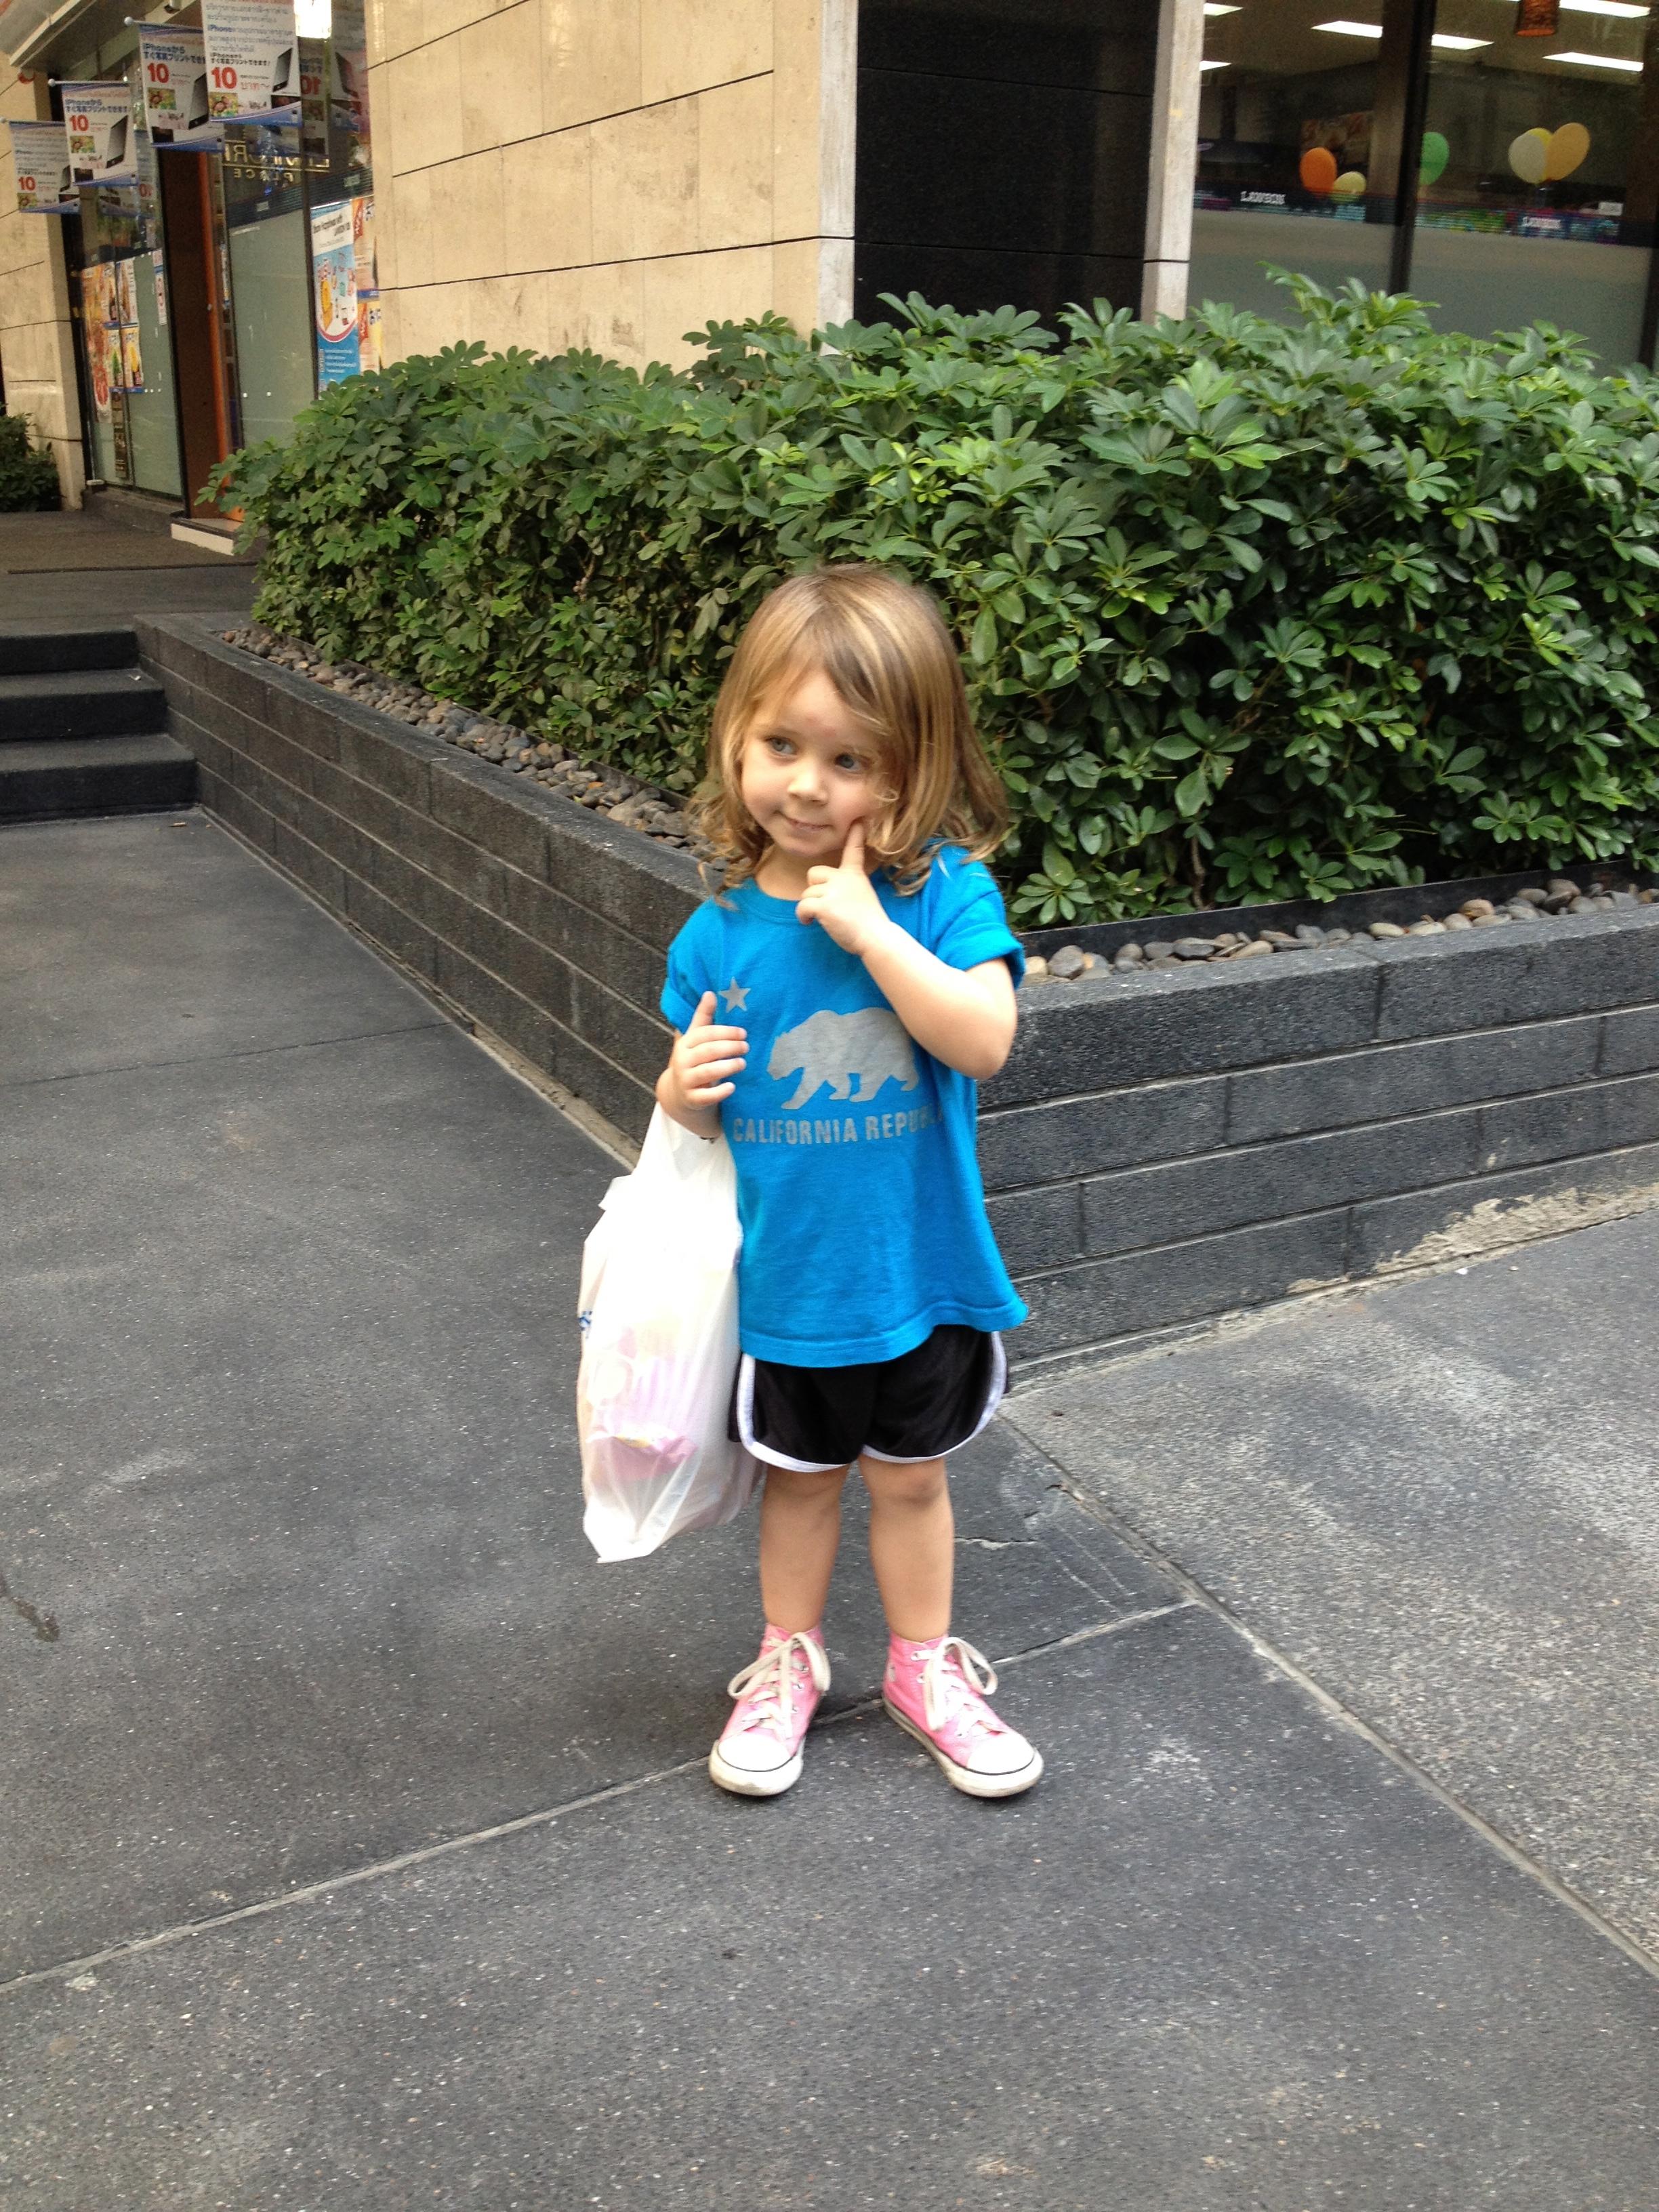 Senya with groceries